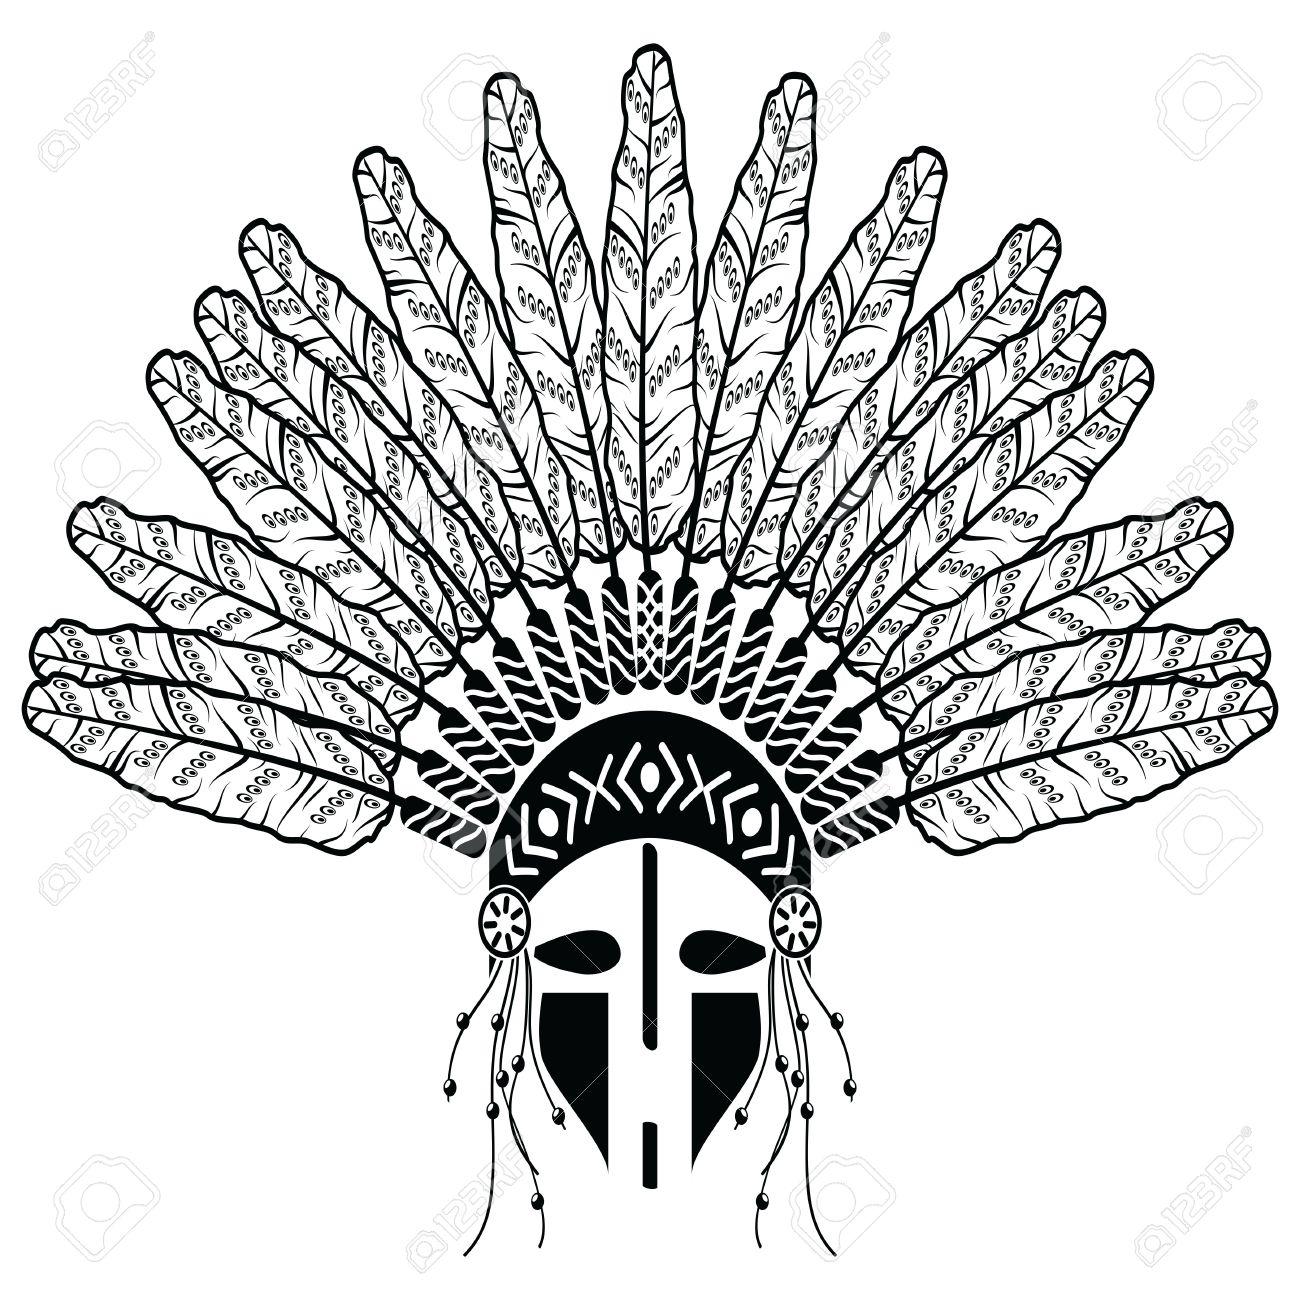 1300x1300 Aztec, Ethnic Style Headdress With Plain Feathers, Beads